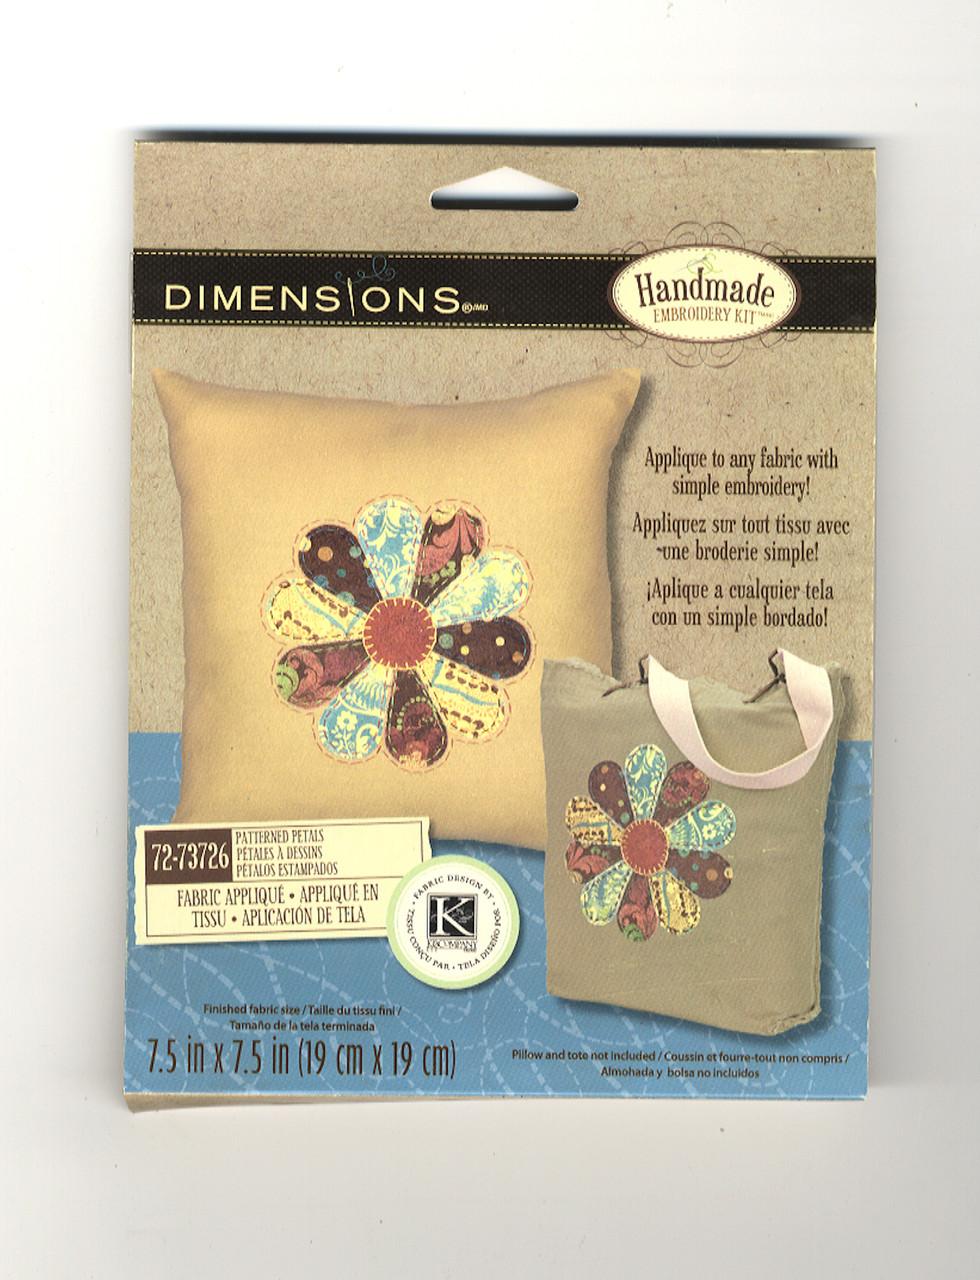 Dimensions - Patterned Petals